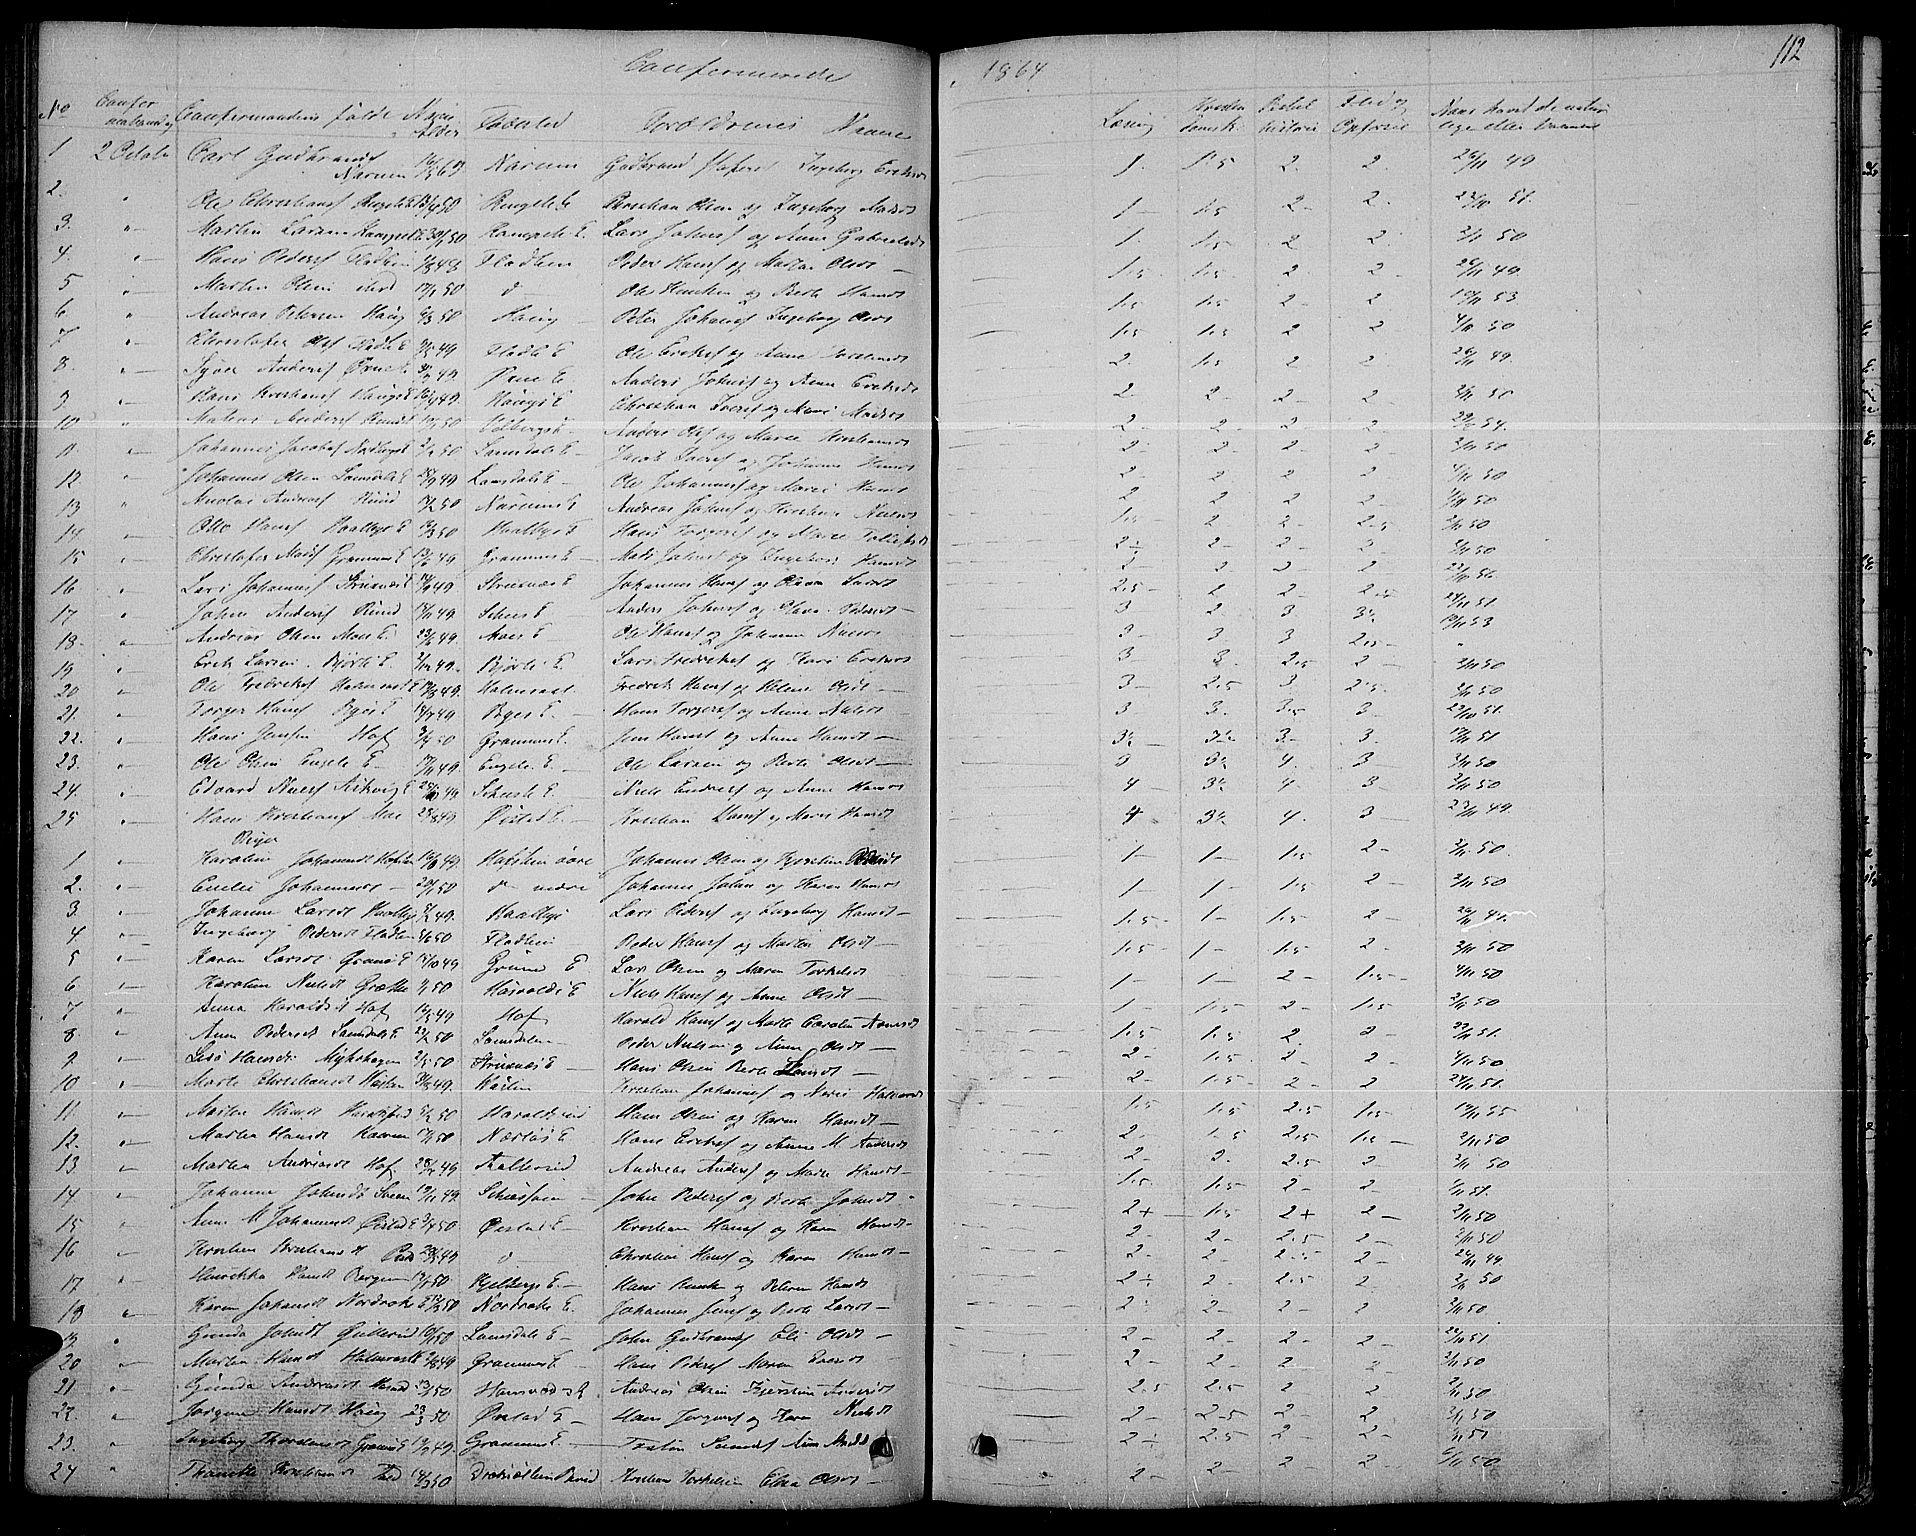 SAH, Søndre Land prestekontor, L/L0001: Klokkerbok nr. 1, 1849-1883, s. 112